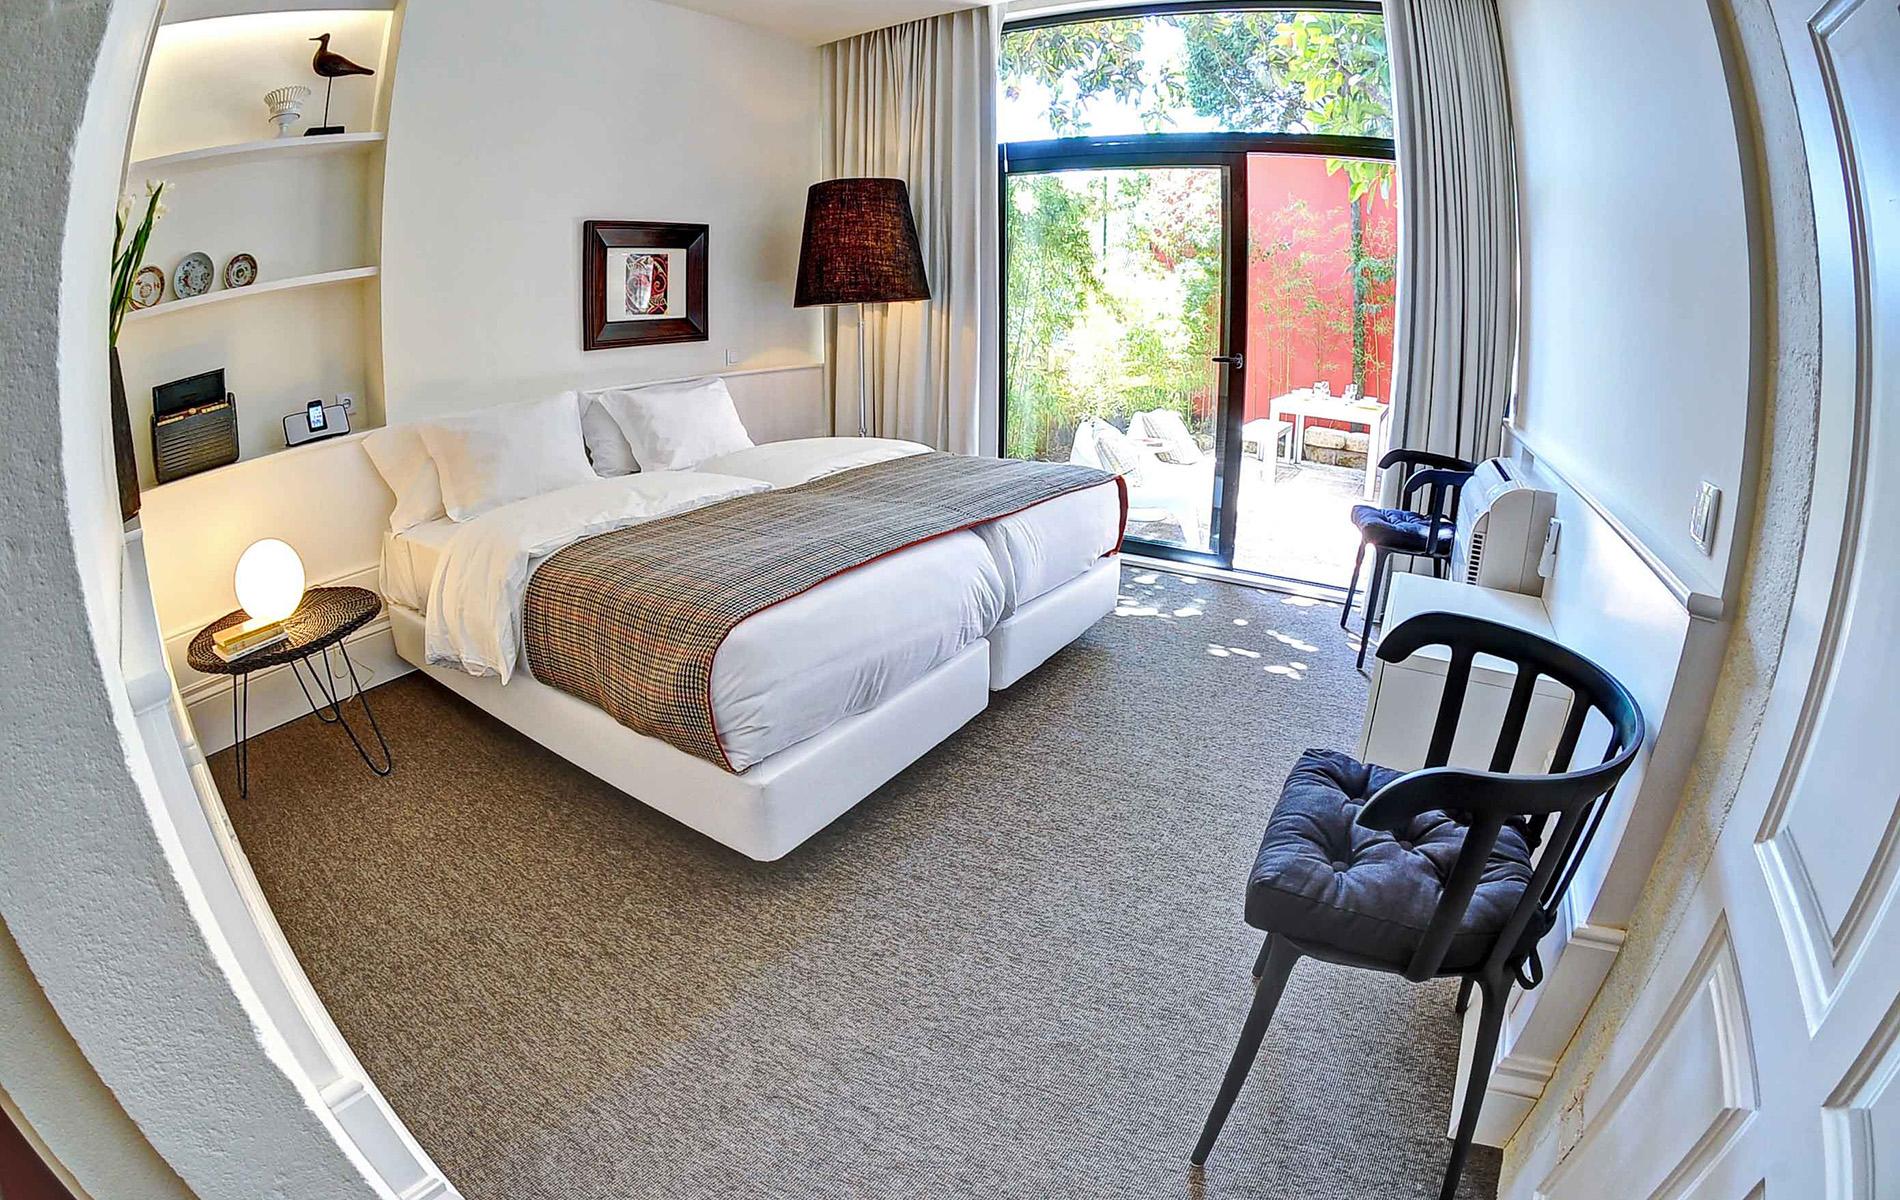 superior 2 bedroom apartment three houses apartments superior 2 bedroom apartment three houses apartments 2